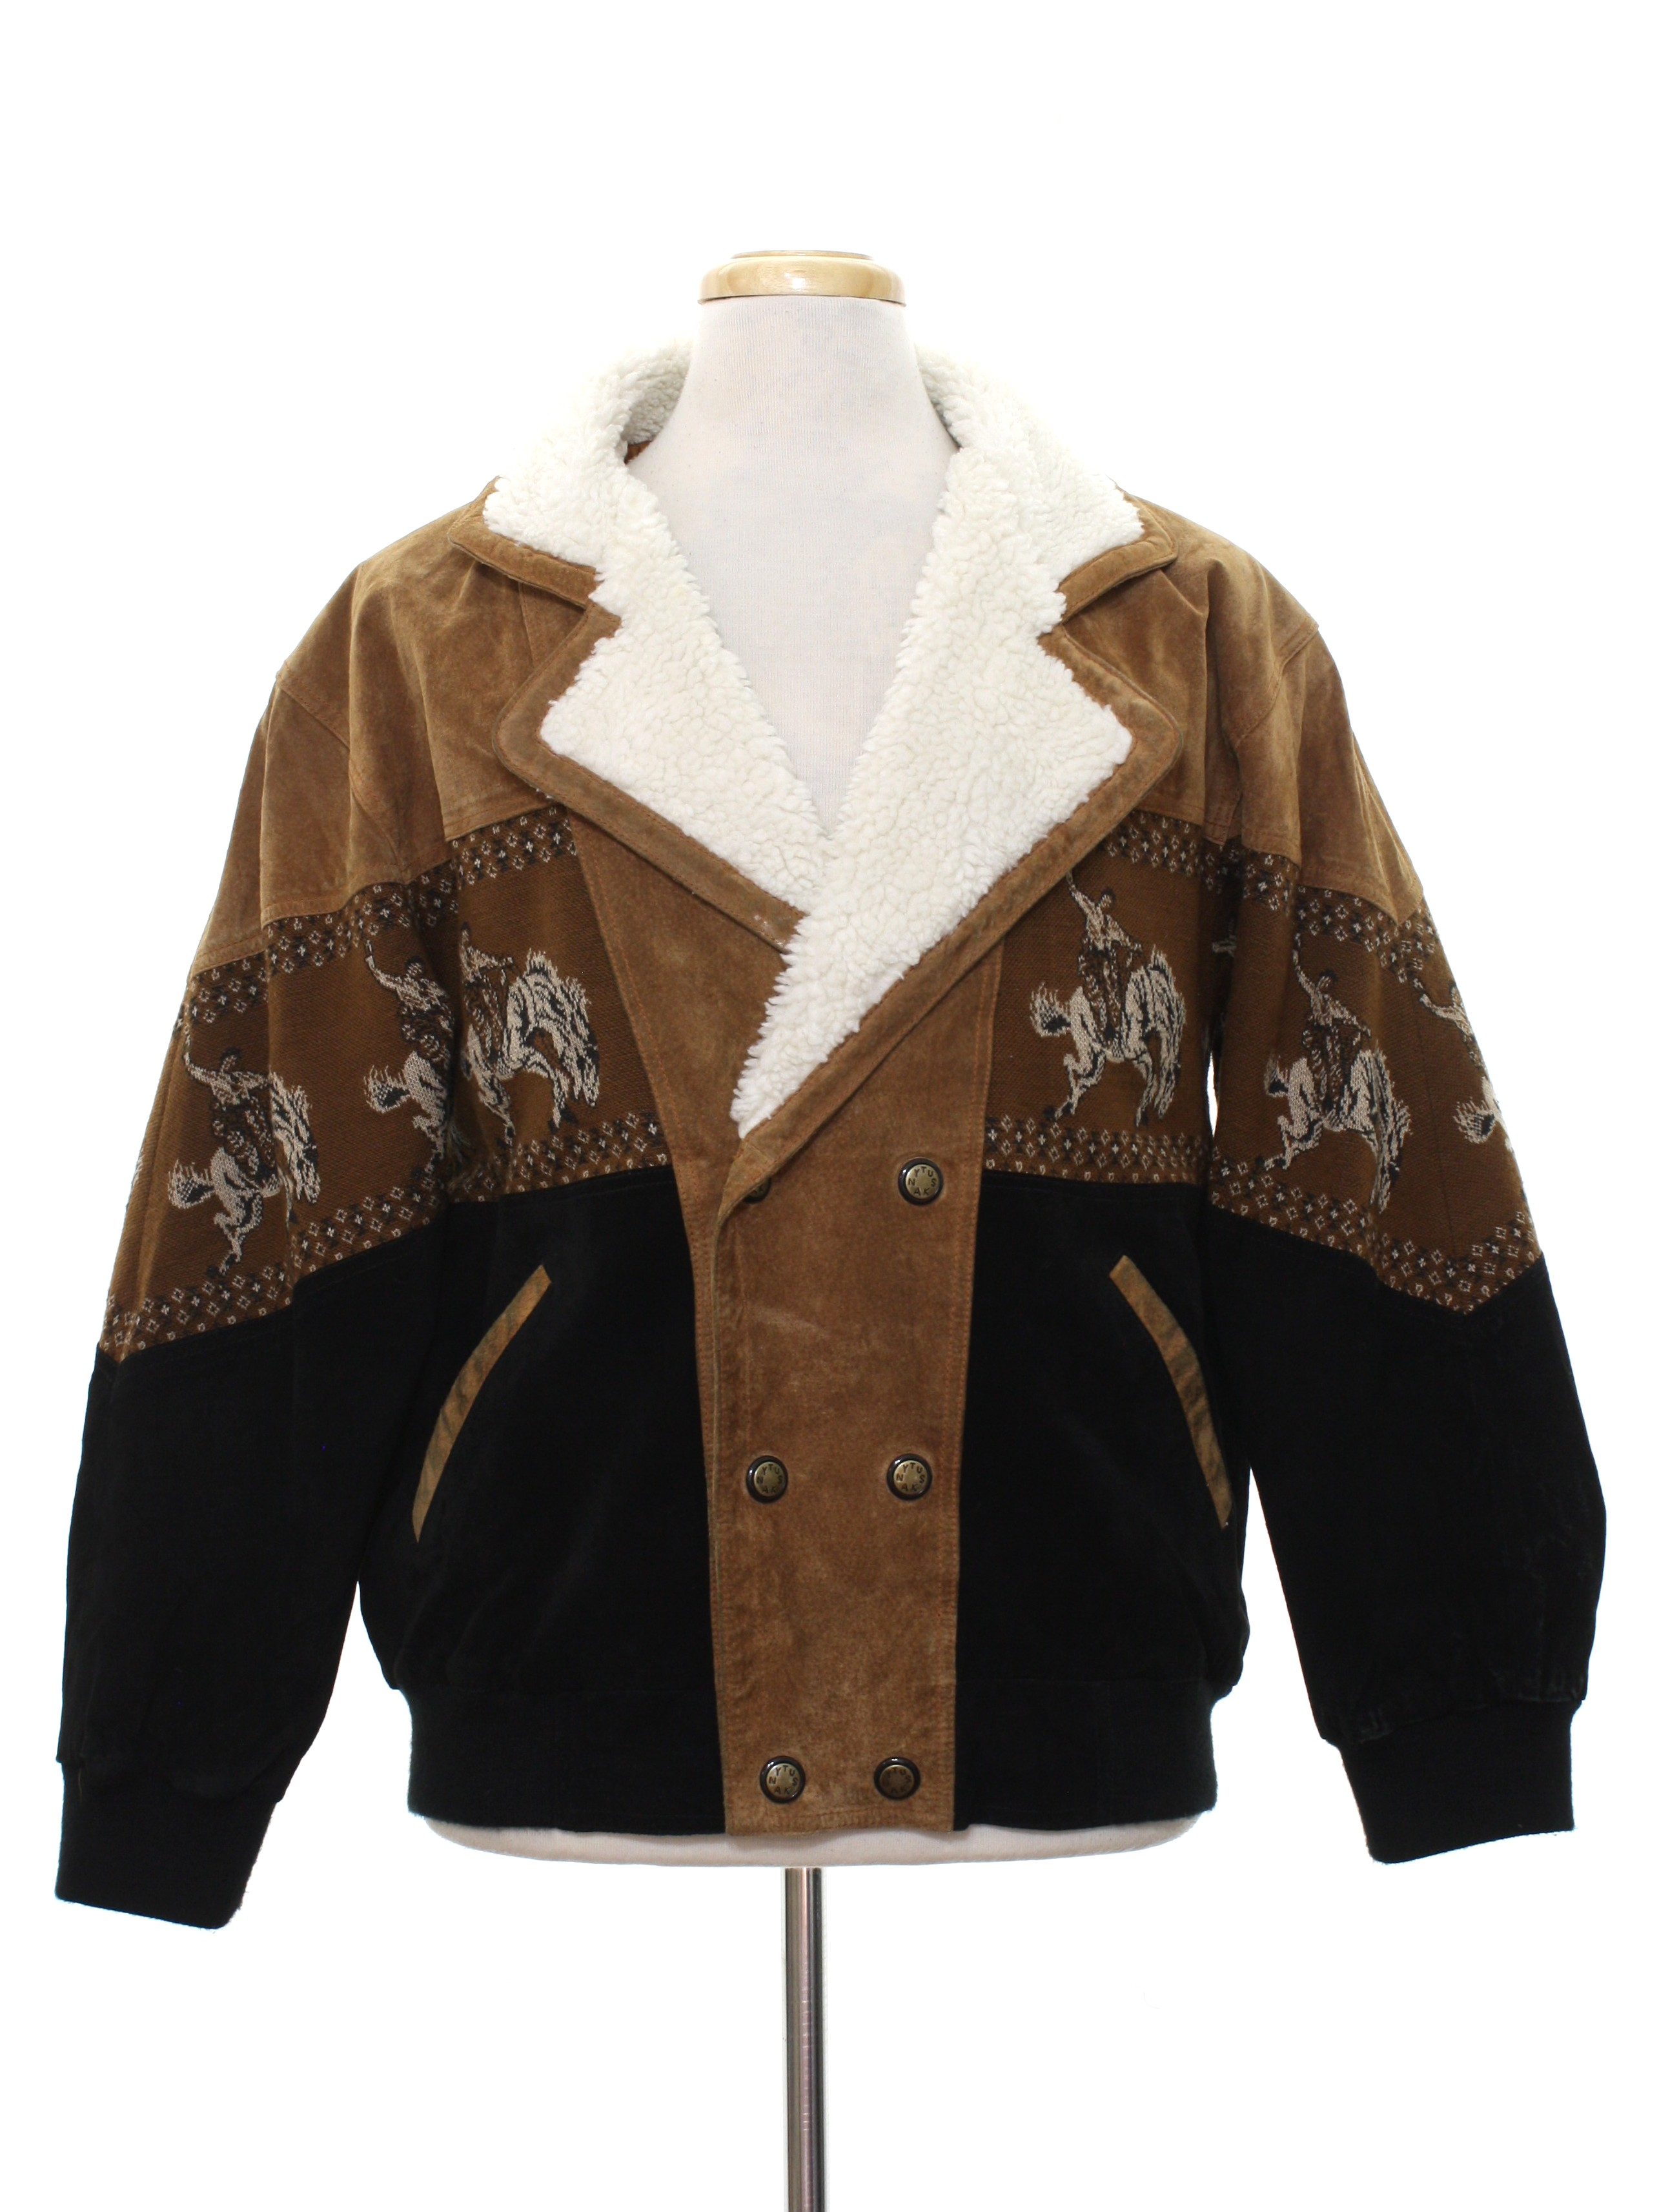 Tuskany Leather 1980s Vintage Leather Jacket 80s Tuskany